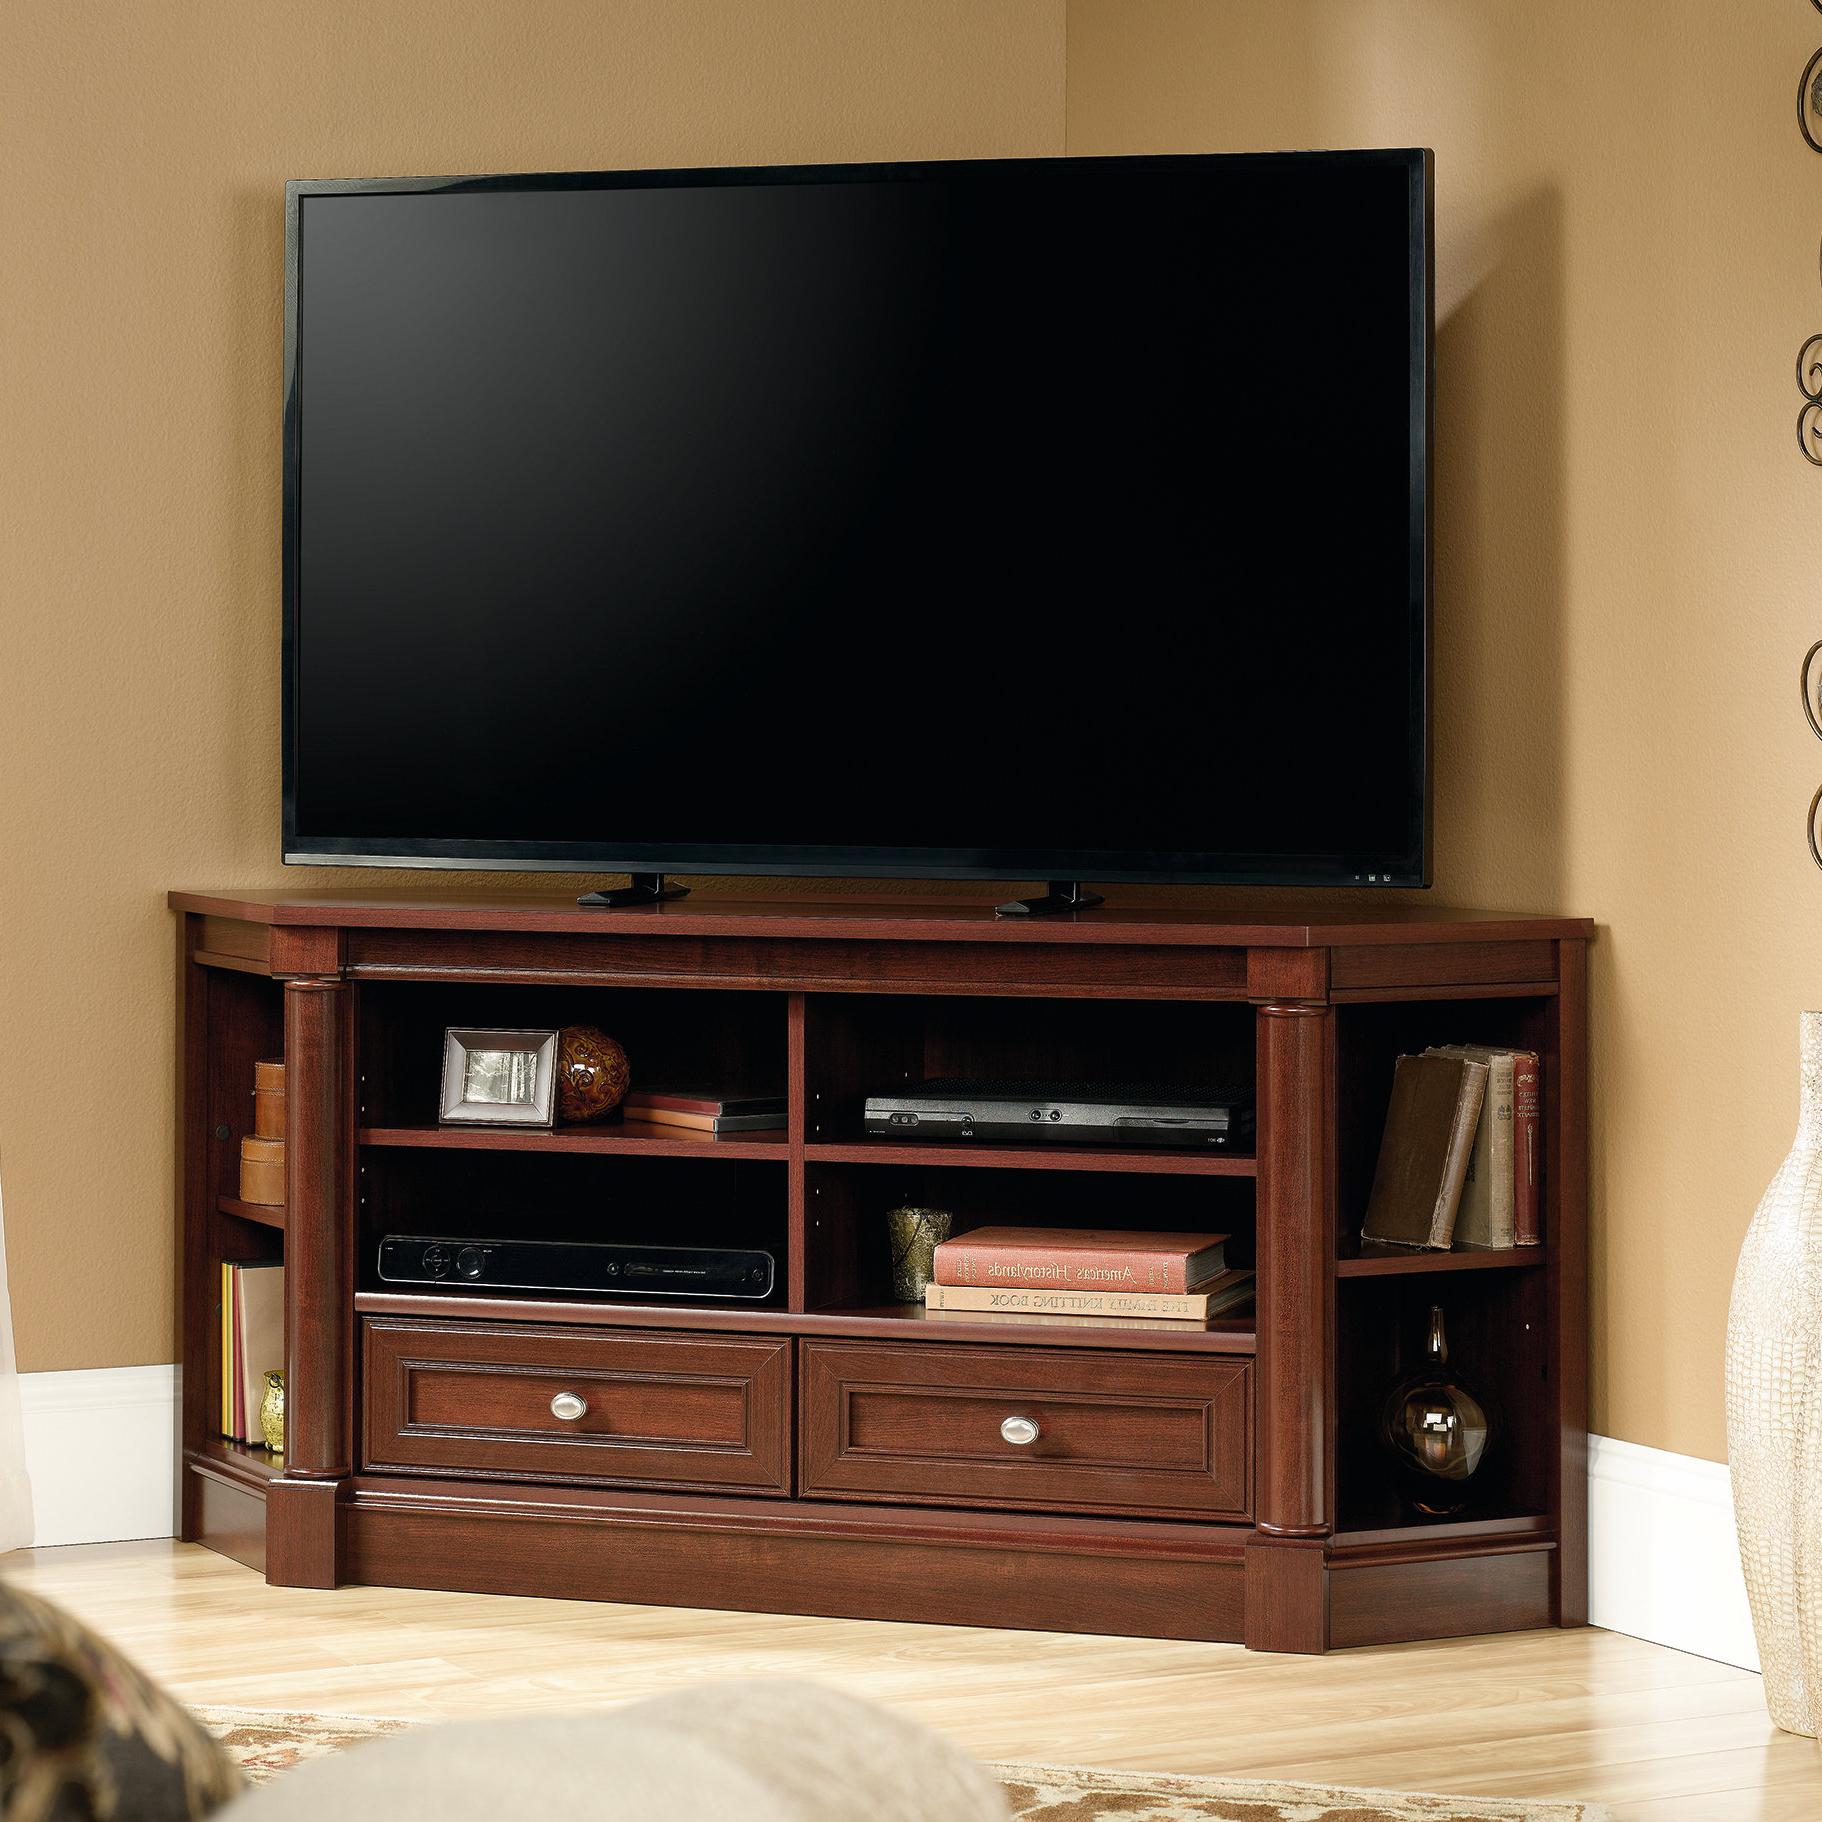 Wayfair Throughout Current Wayfair Corner Tv Stands (View 2 of 20)